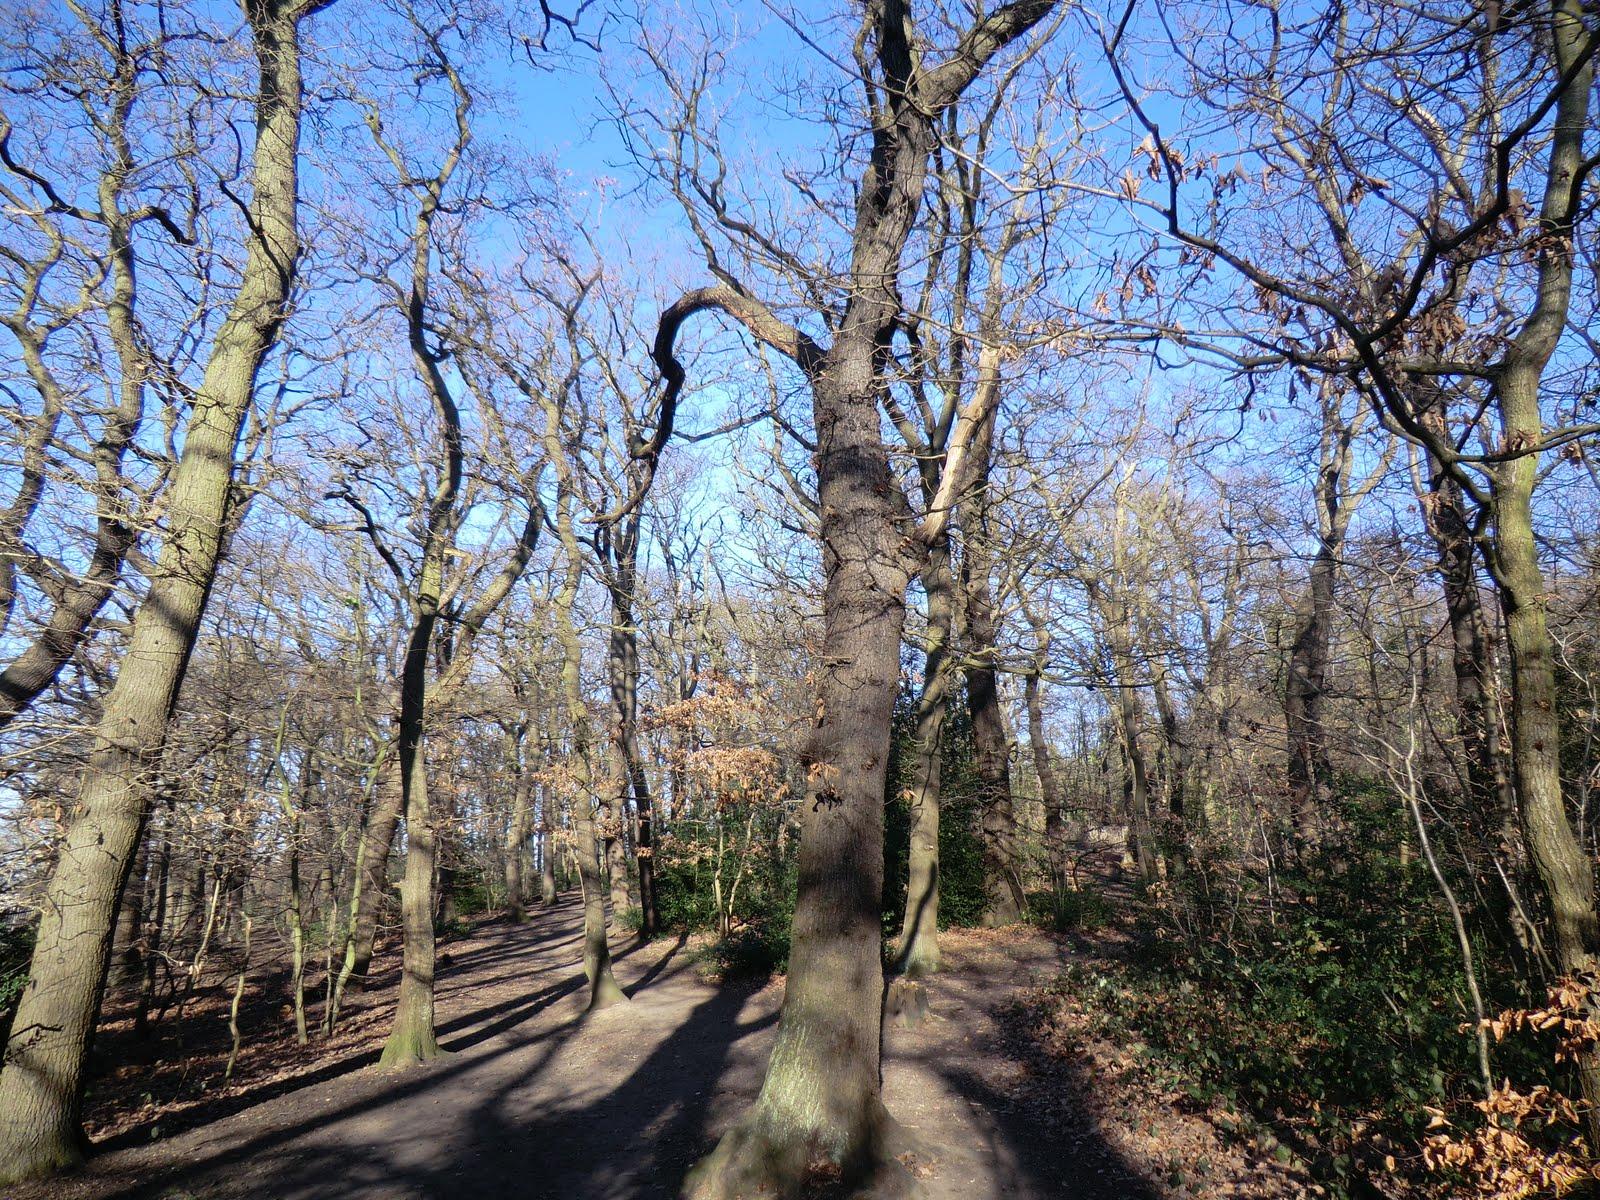 CIMG1608 Dulwich Wood in winter